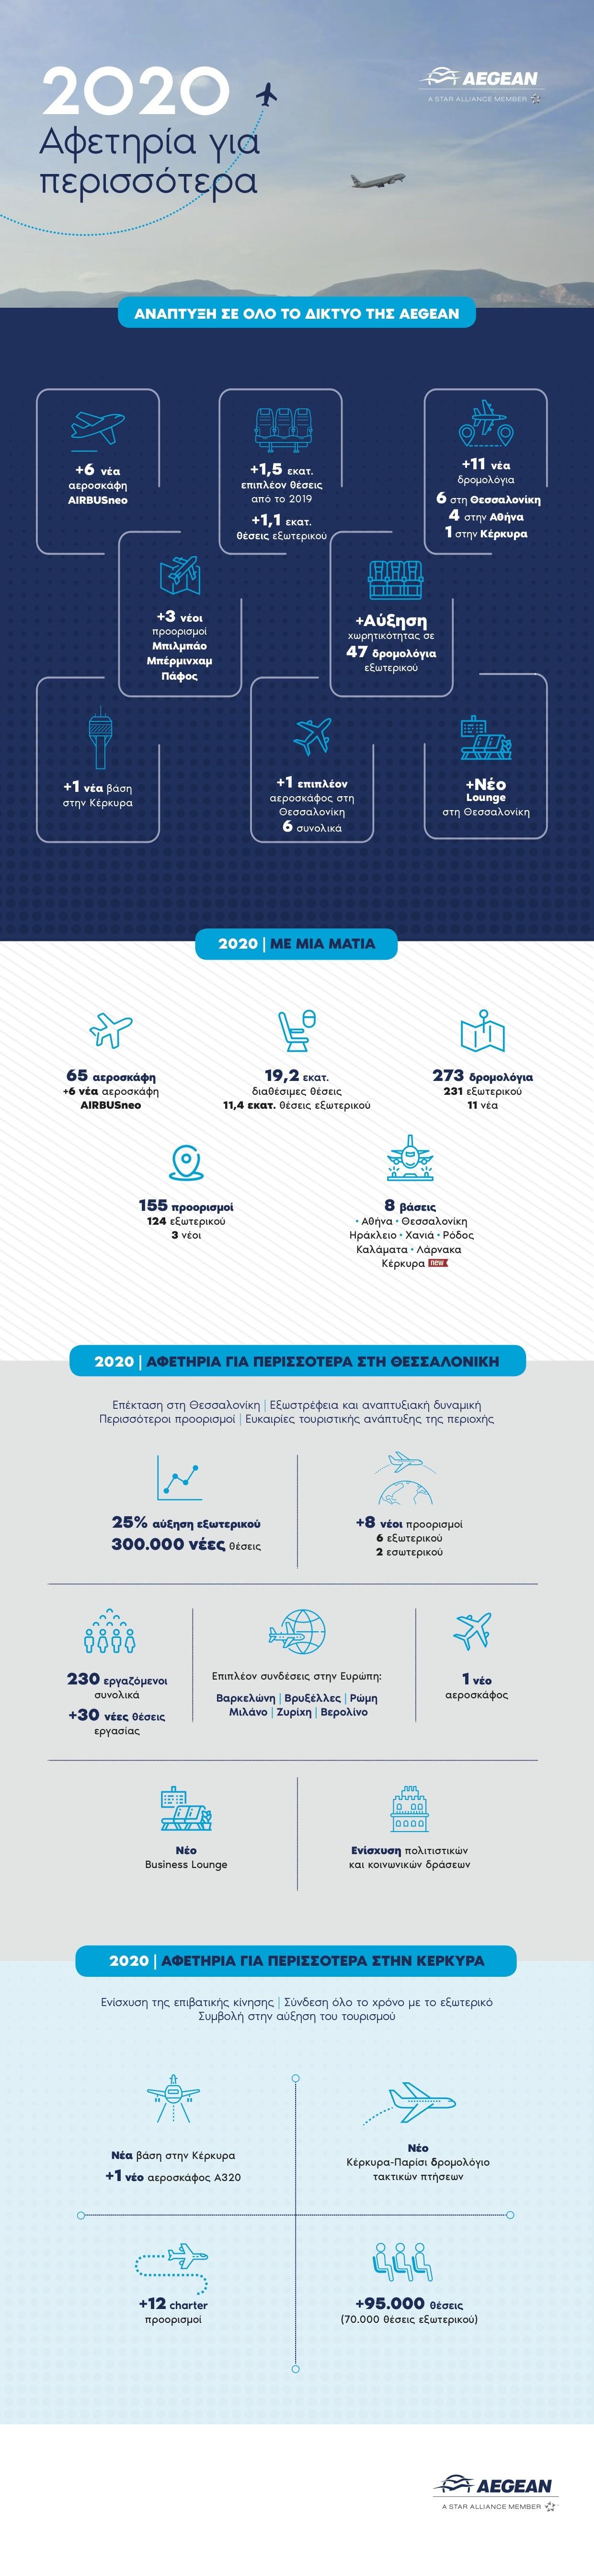 infographic-aegean-12122019.jpg